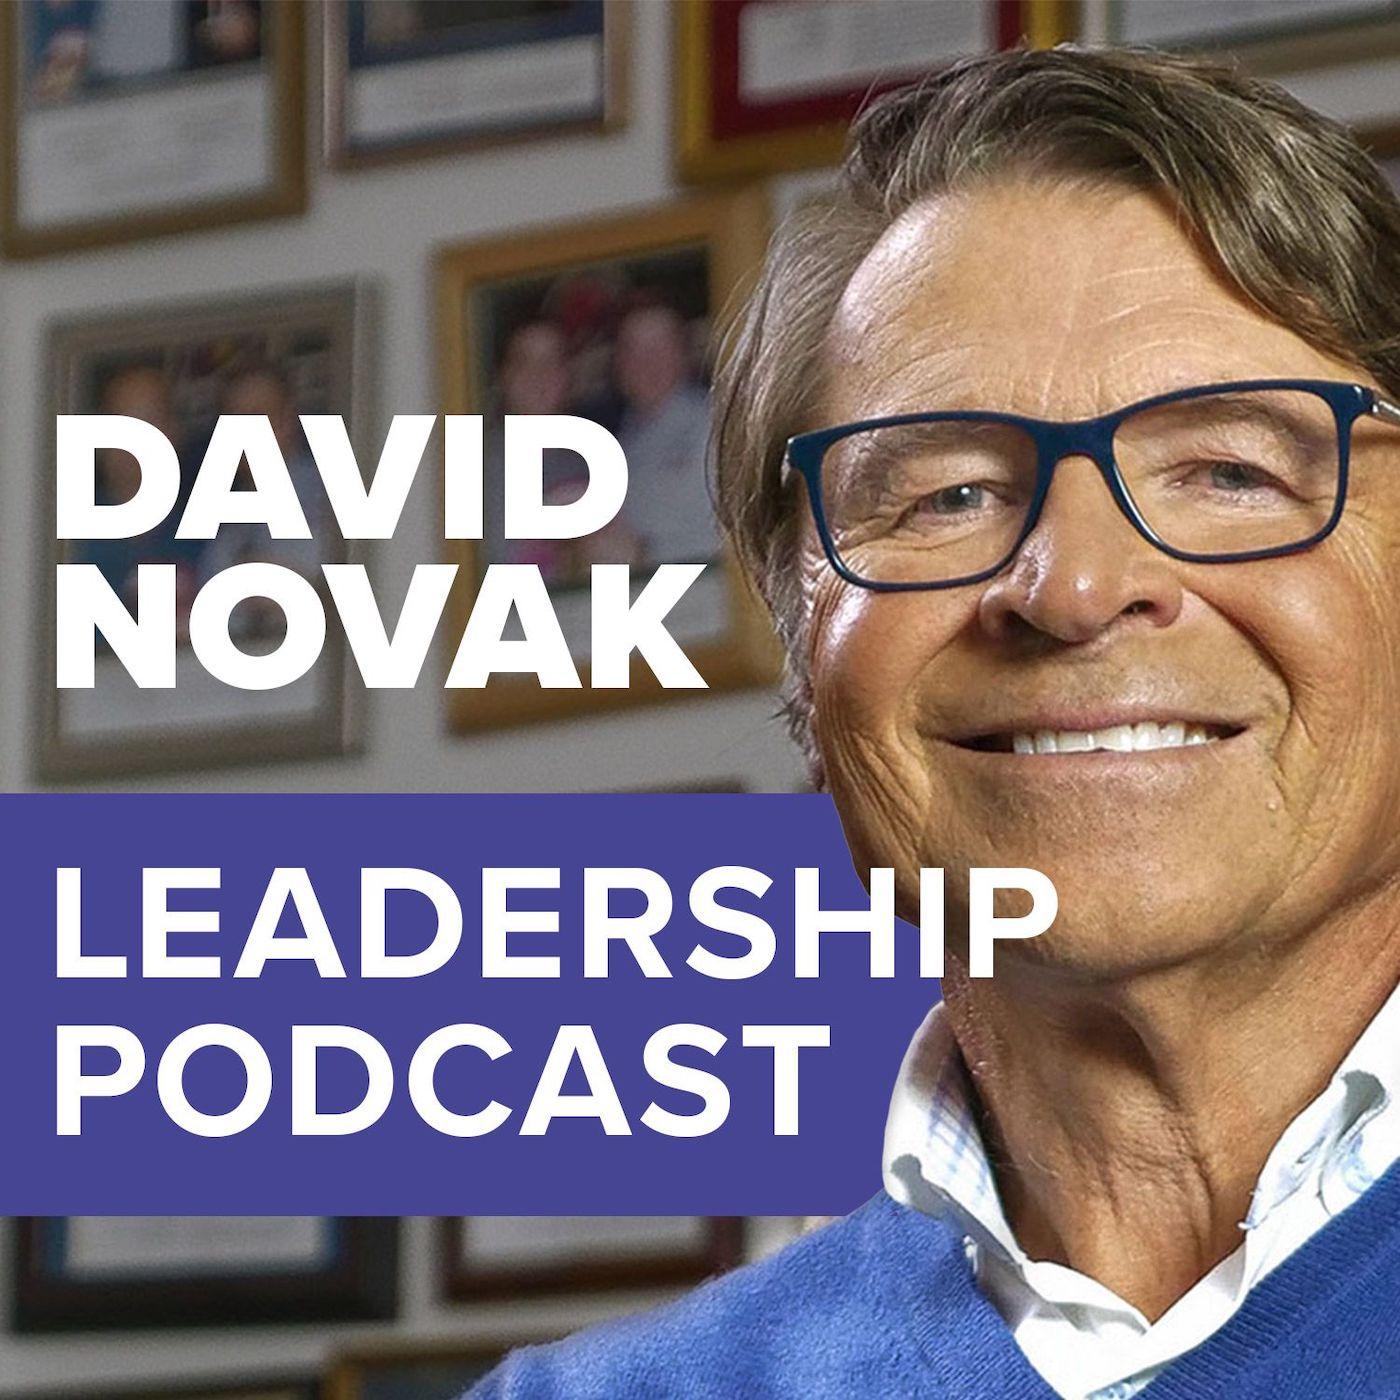 Podcast Cover of David Novak Leadership Podcast